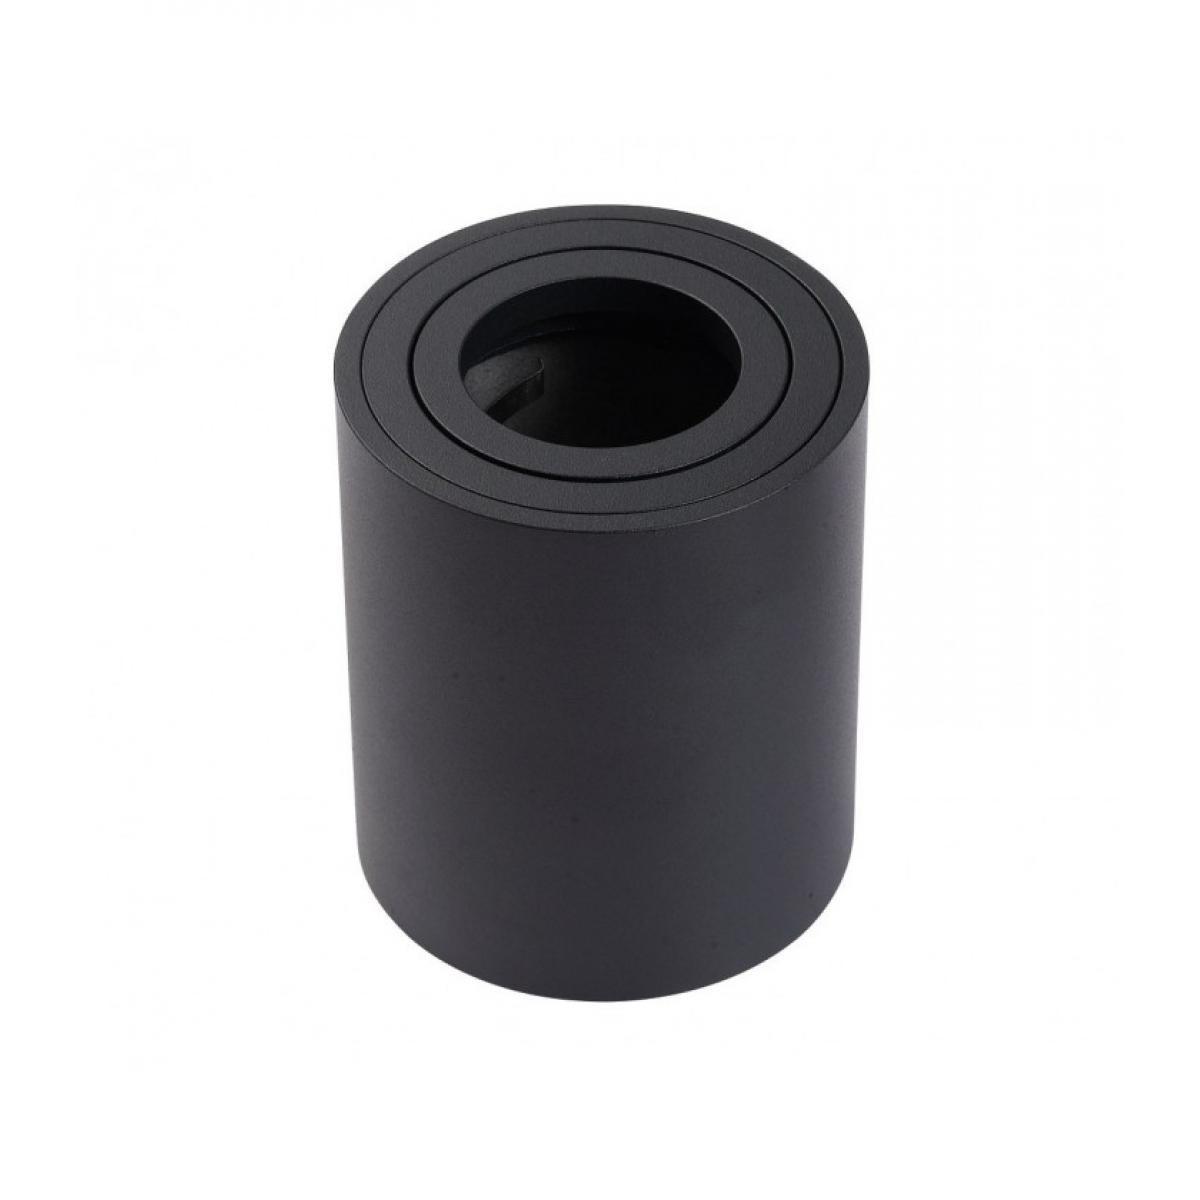 Delitech Support saillie GU10 / MR16 Orientable - Rond - Noir mat